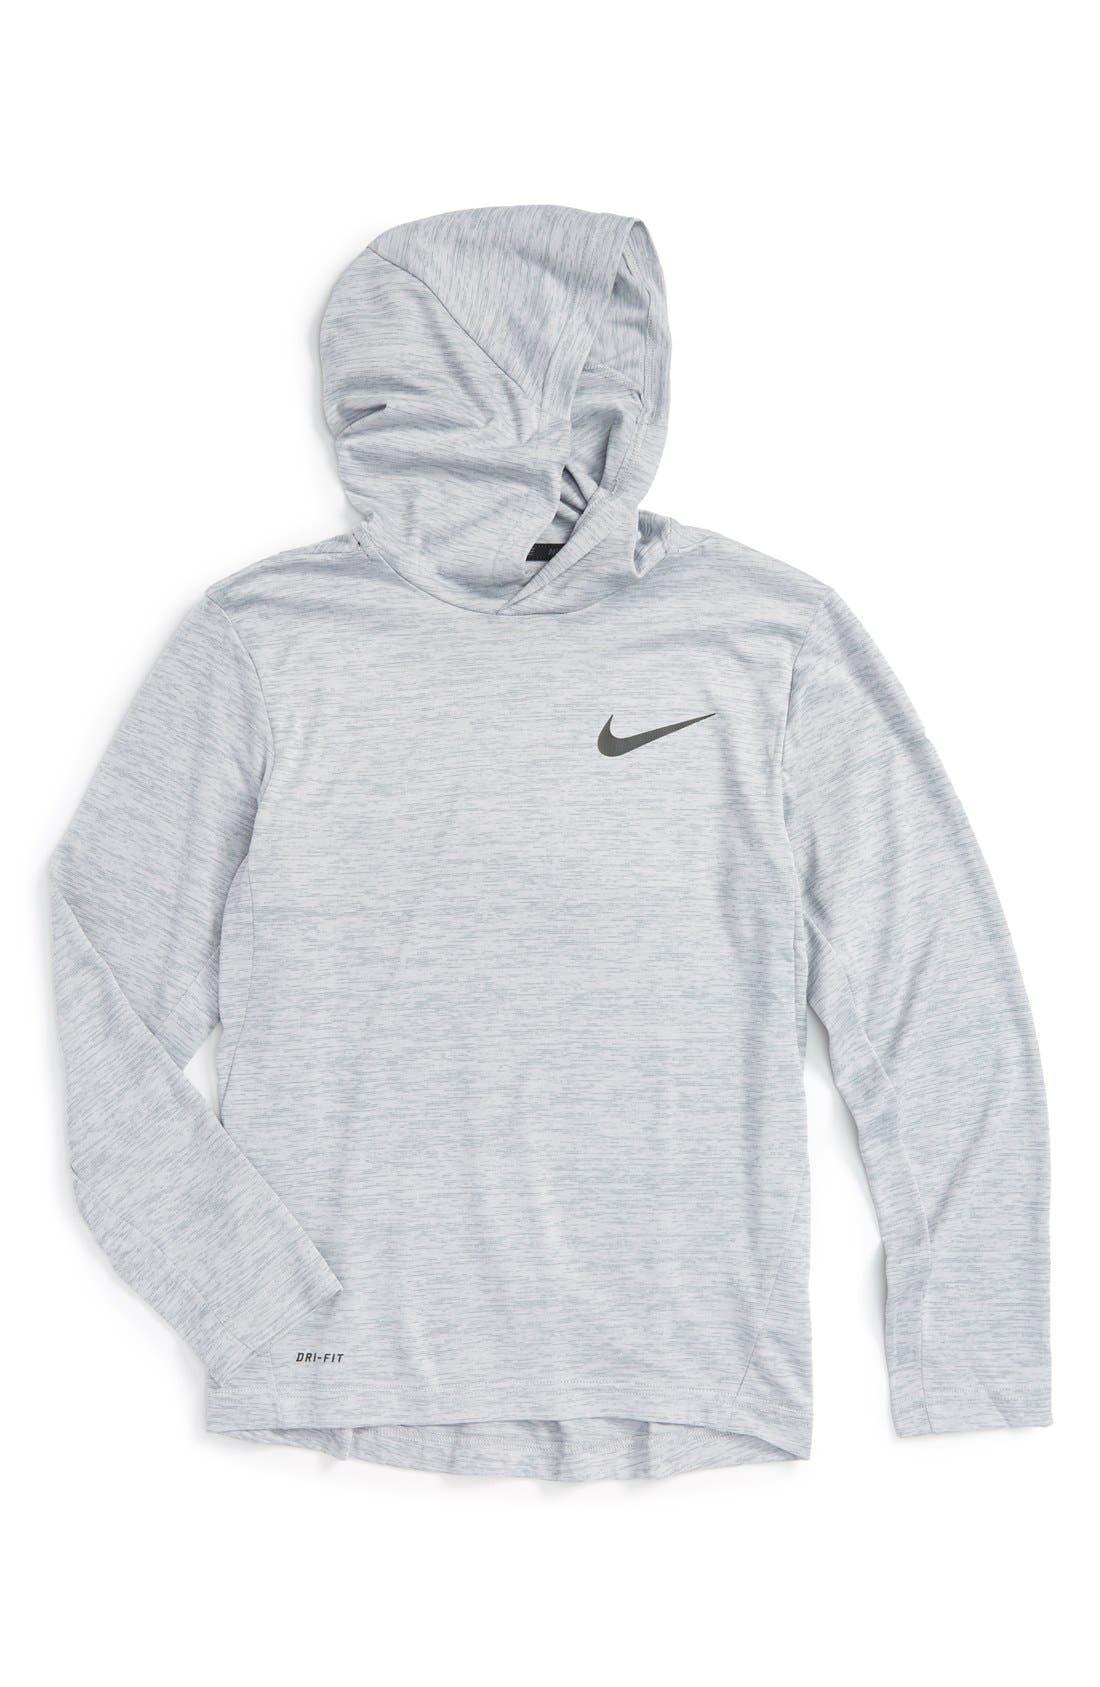 Alternate Image 1 Selected - Nike Hooded Long Sleeve Dri-FIT Training Top (Little Boys & Big Boys)